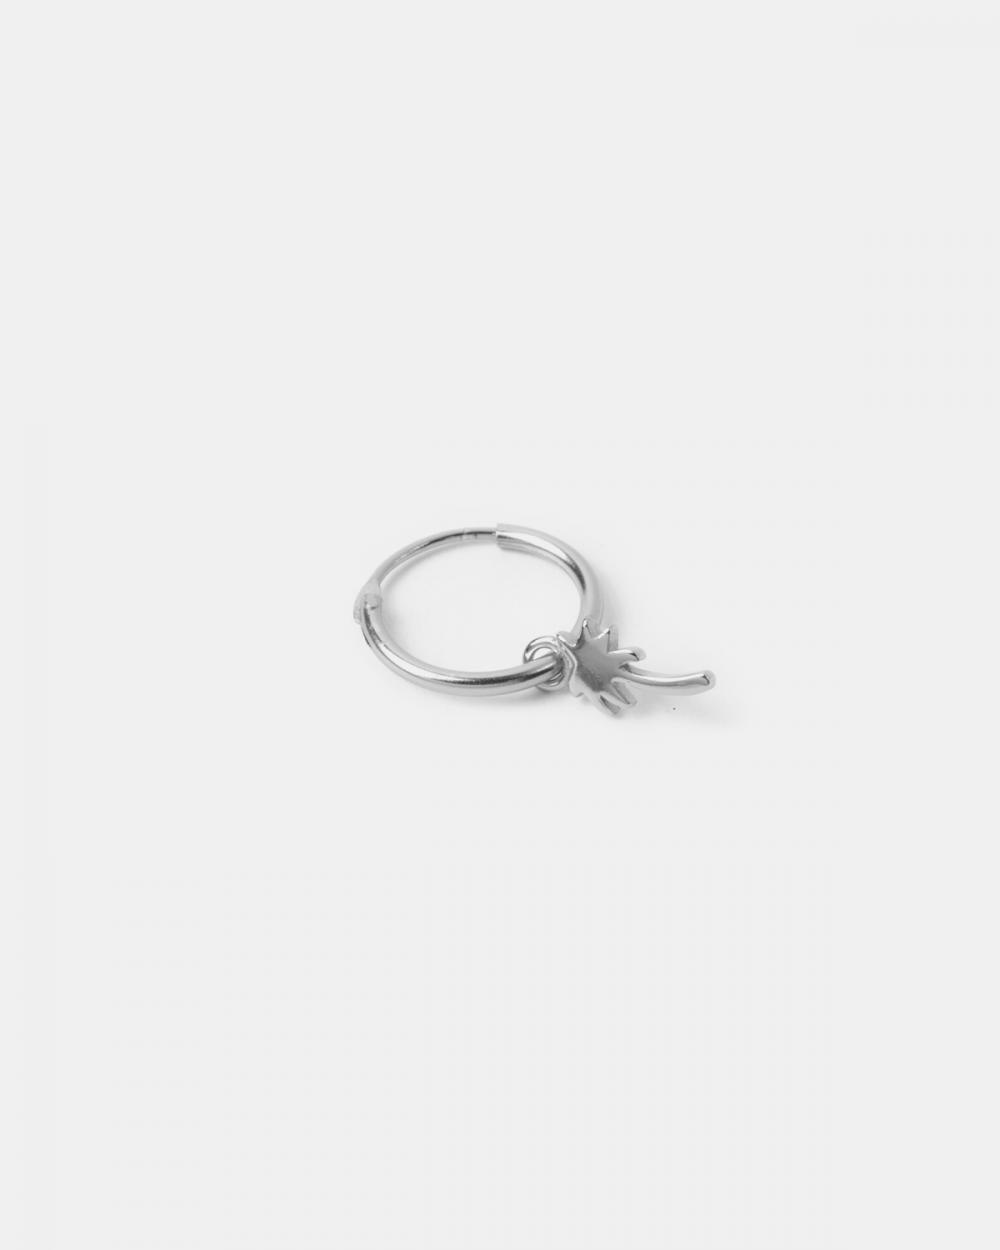 Earrings ORECCHINO SINGOLO CERCHIO E PALMA CHARM / RODIO LUCIDO - O/S NOVE25